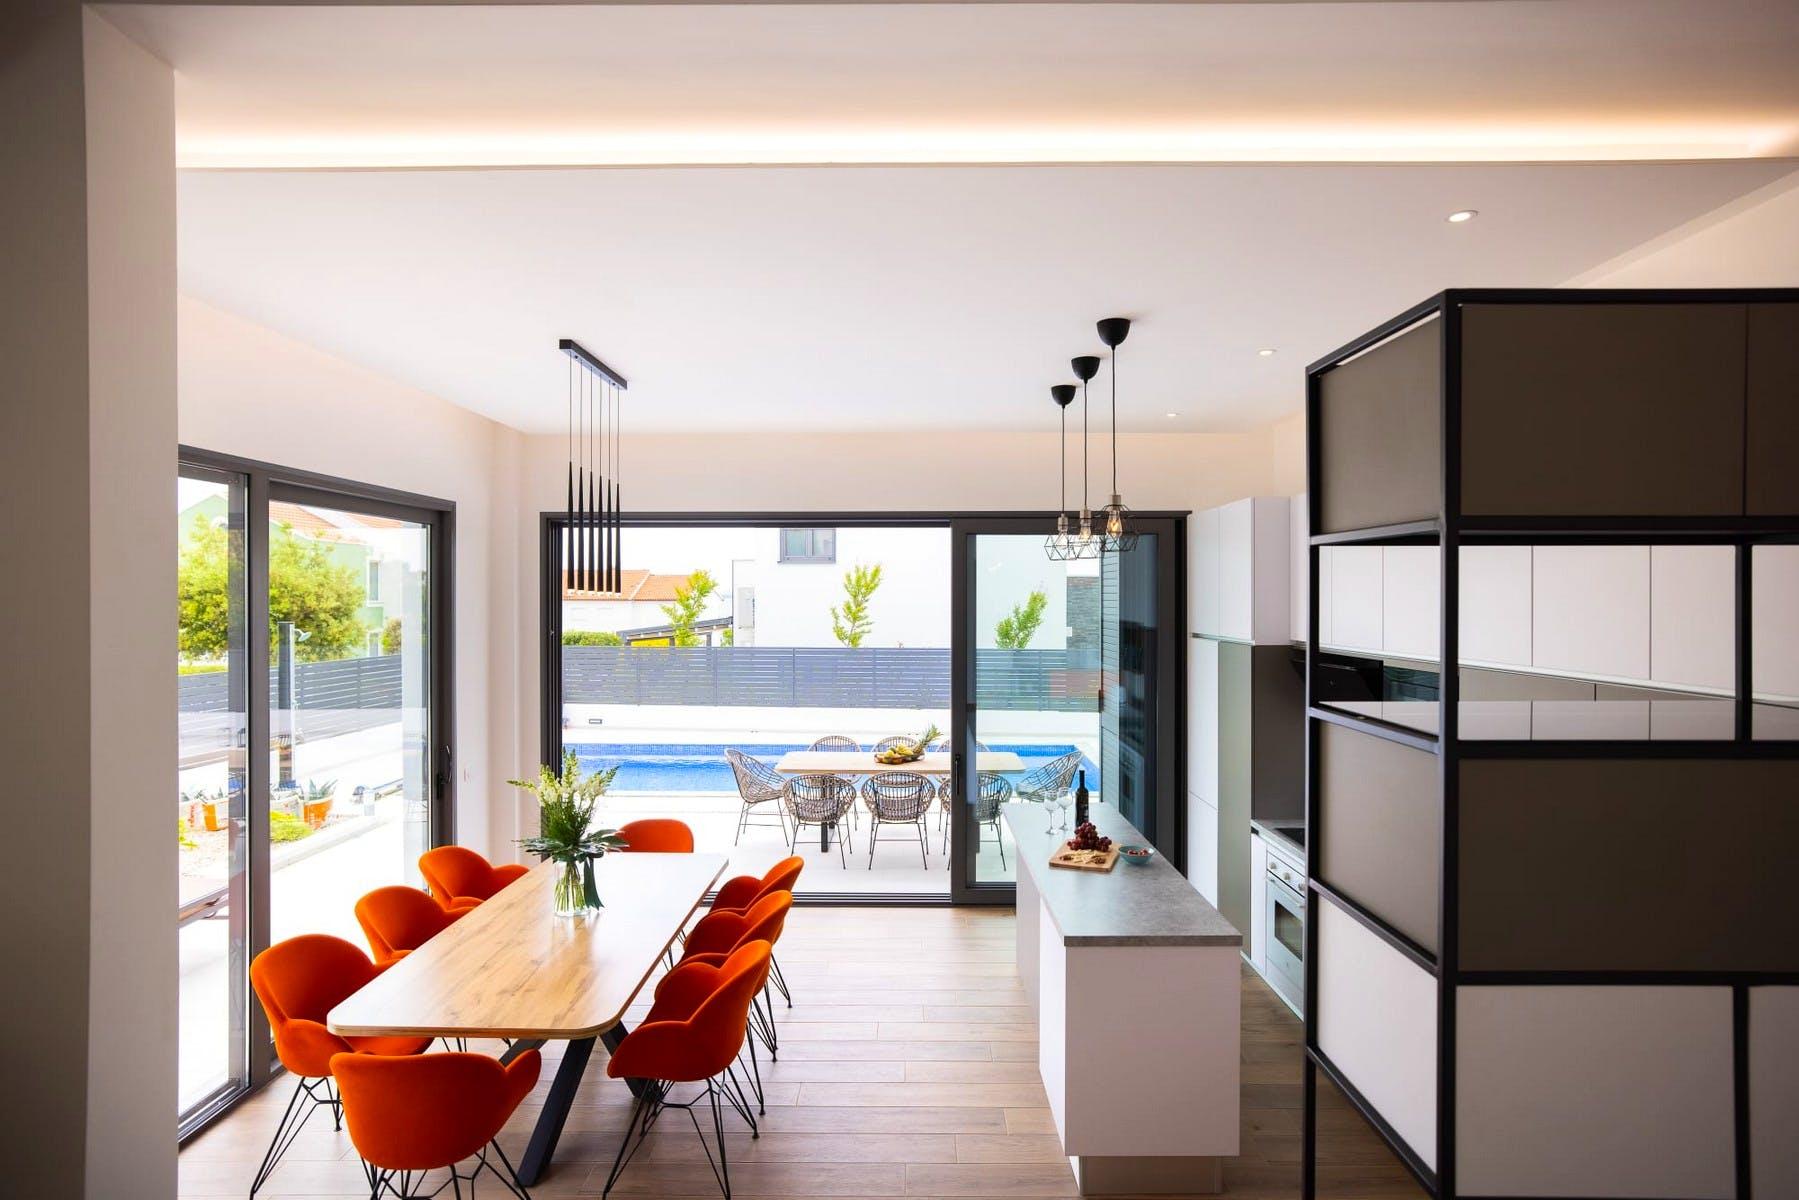 Modern interior design enhanced by colorful details